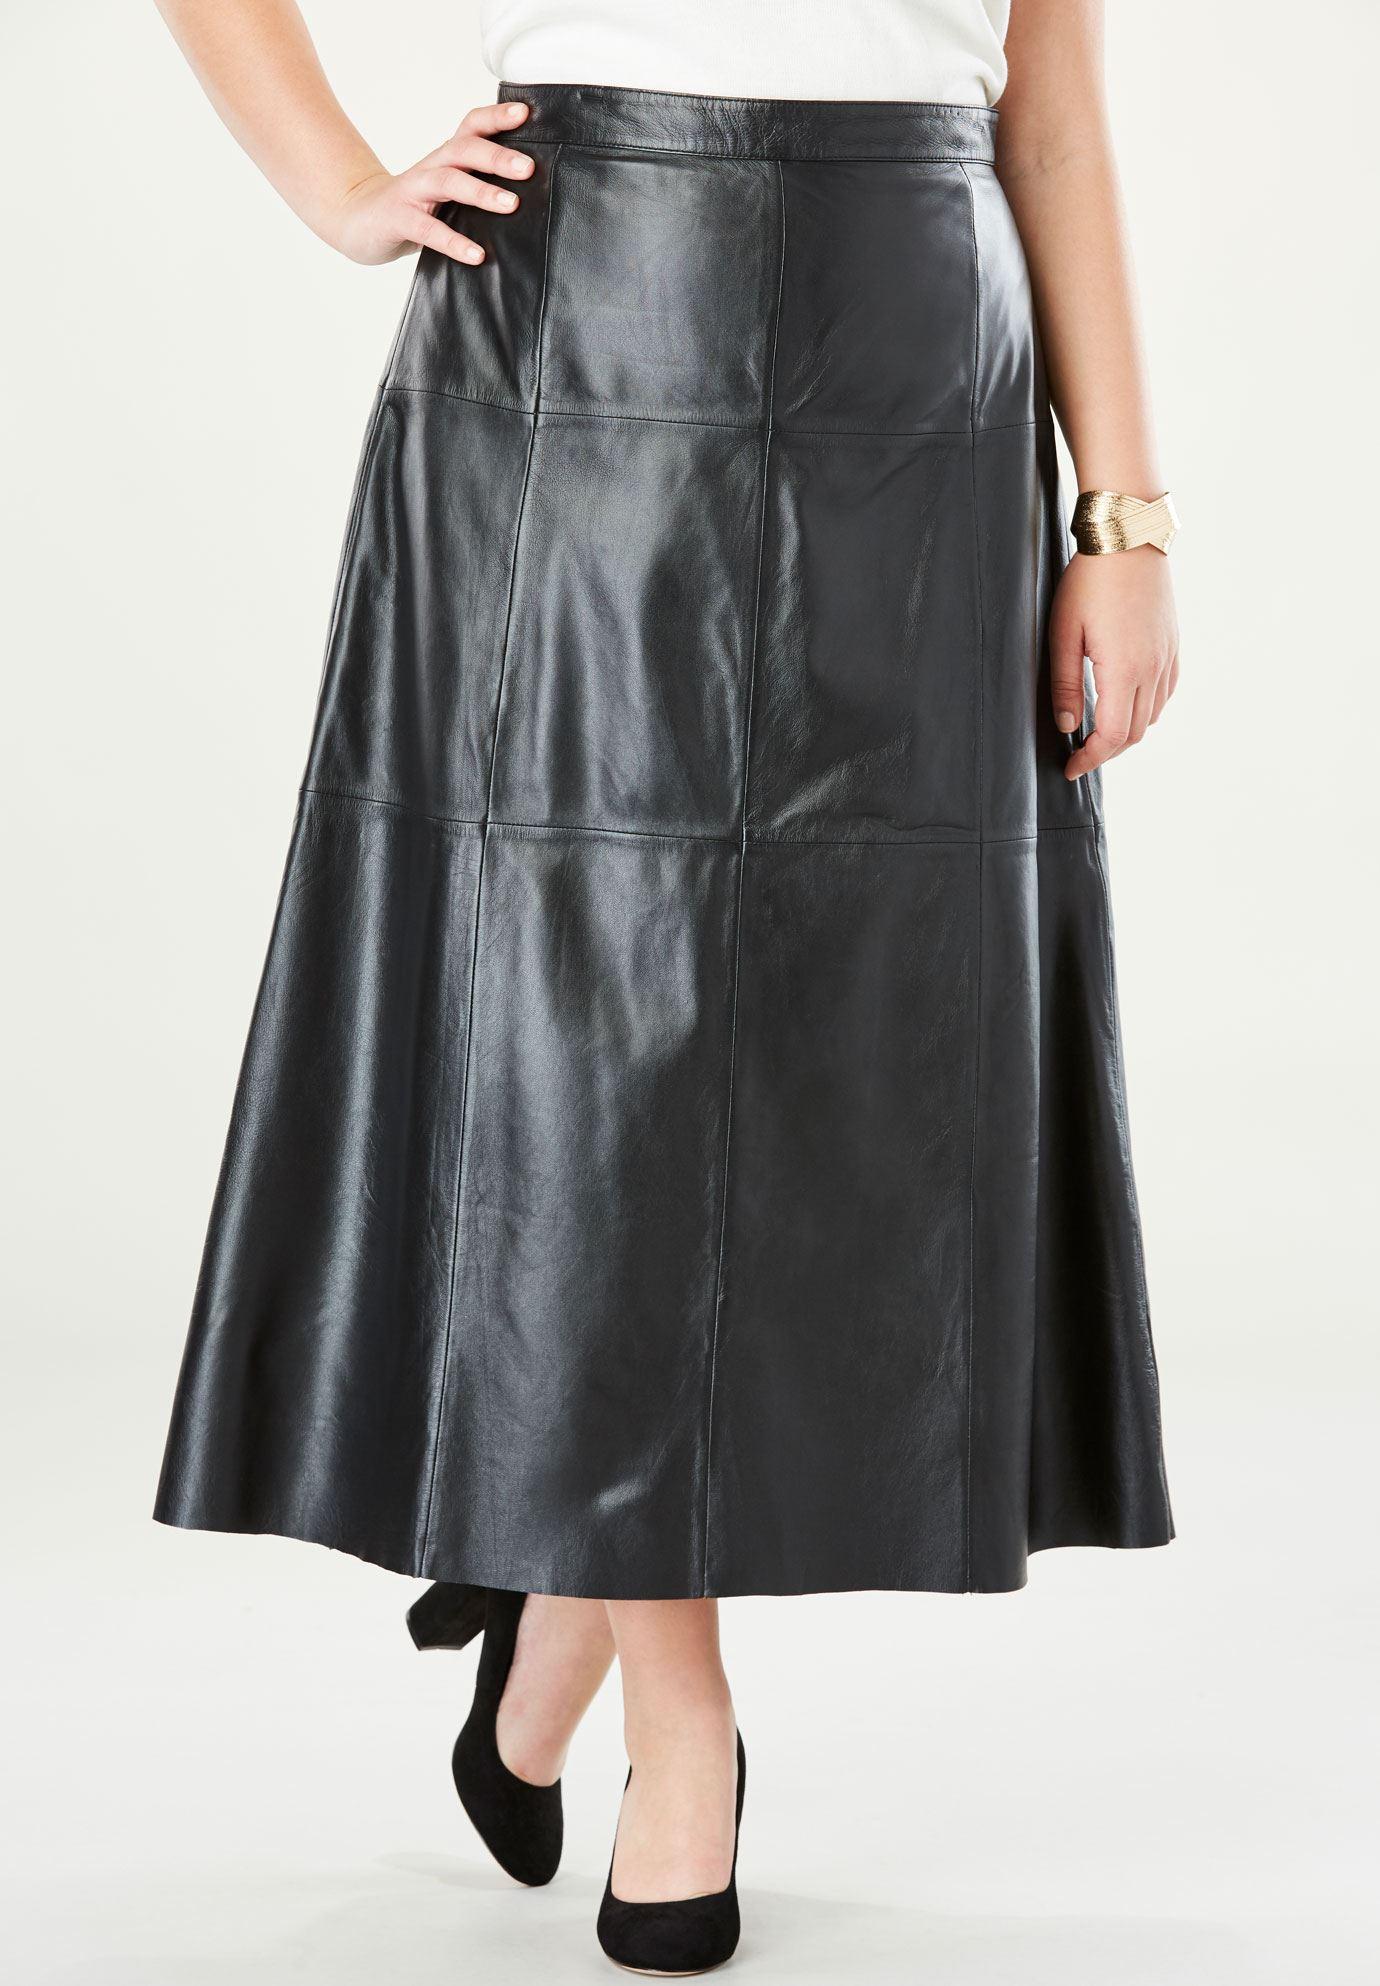 902dd9c458e4d Leather Midi Skirt